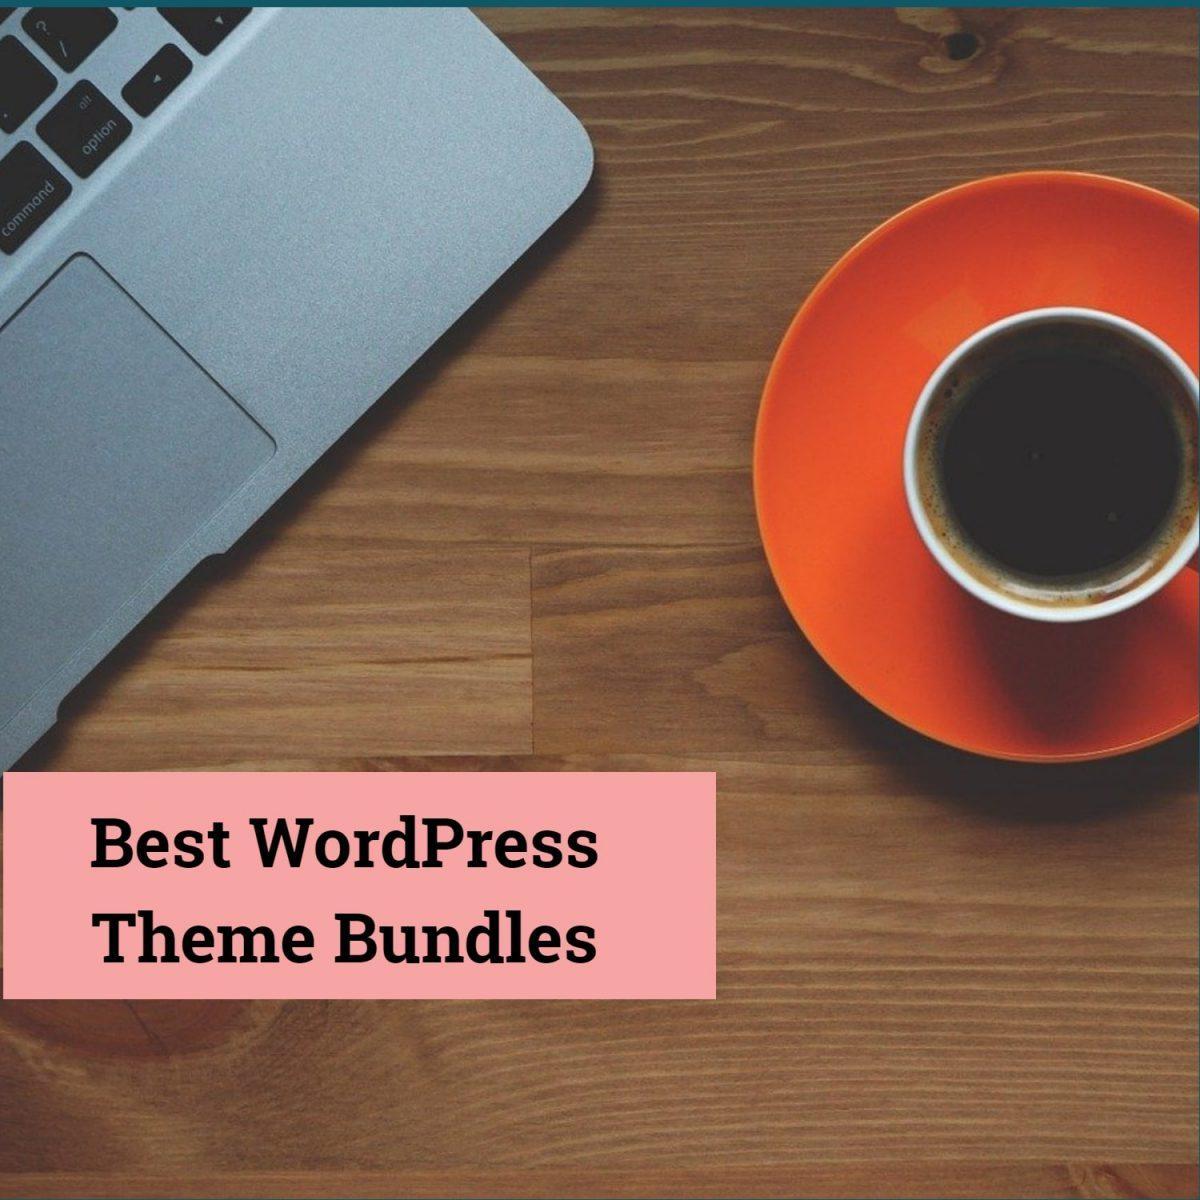 Best WordPress Theme Bundles